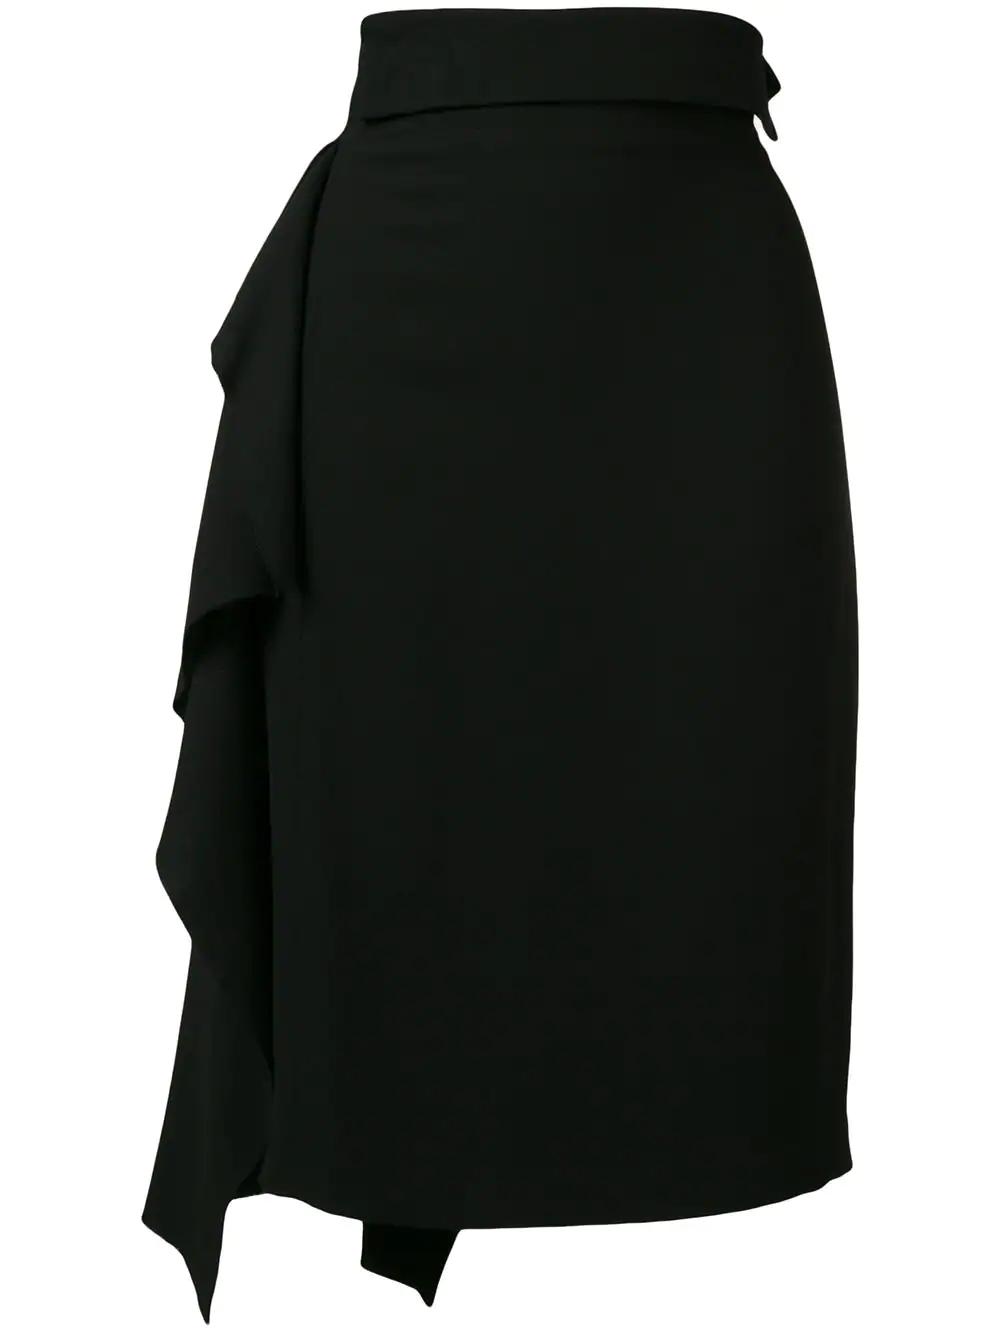 5f37c4bd8 MAISON FLANEUR. Maison Flaneur Ruffle Pencil Skirt - Black